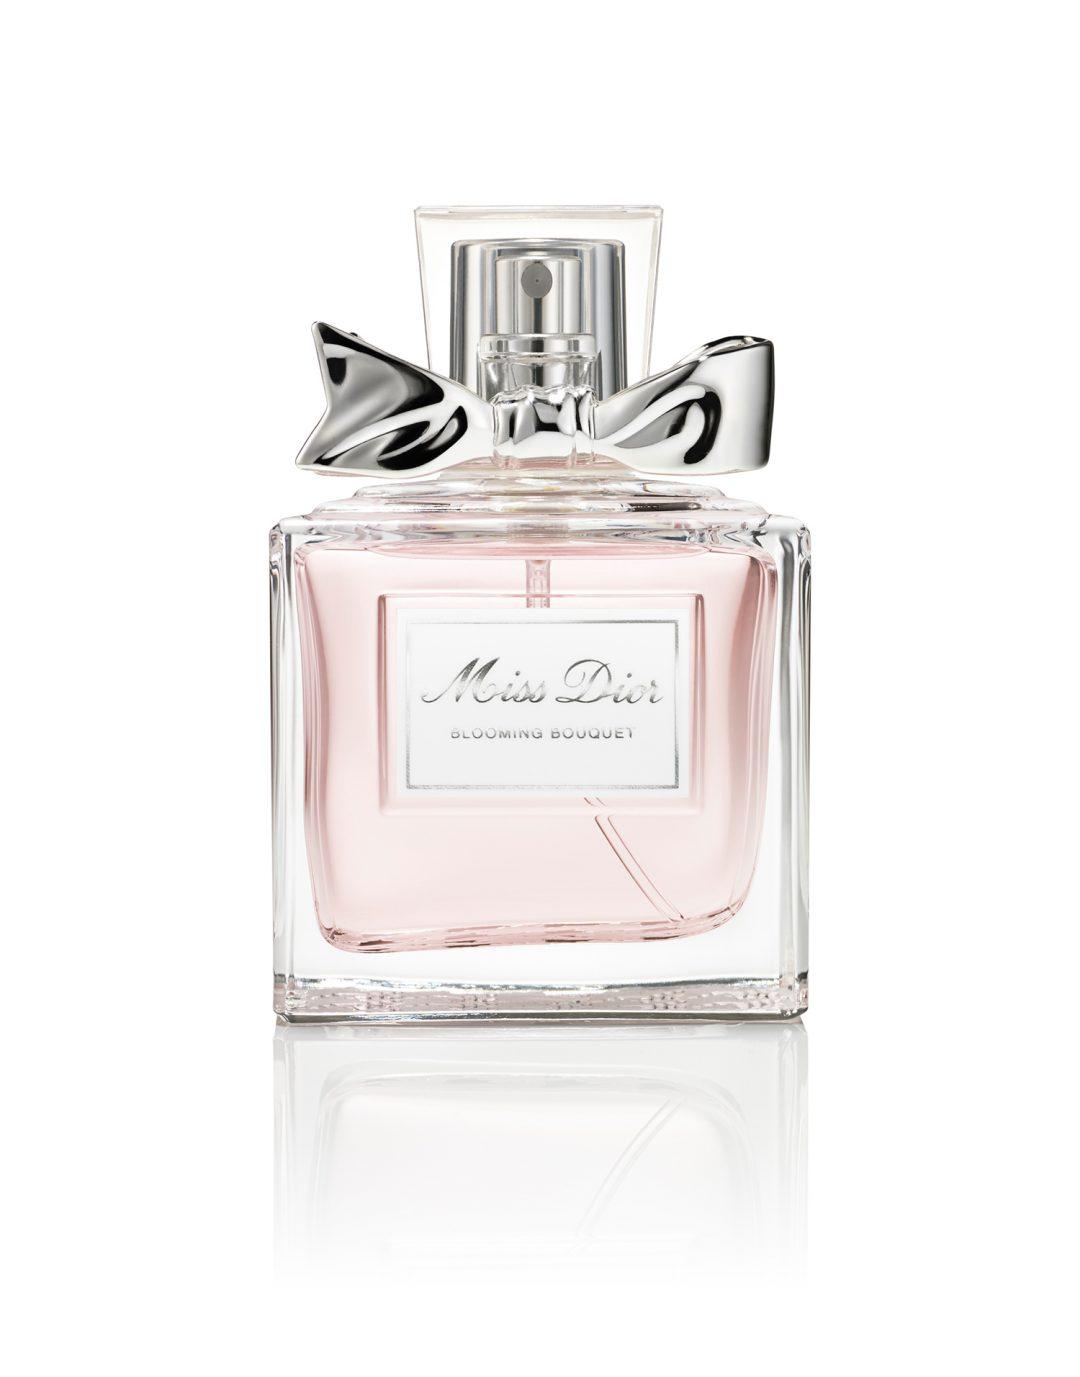 Dior Product Shot